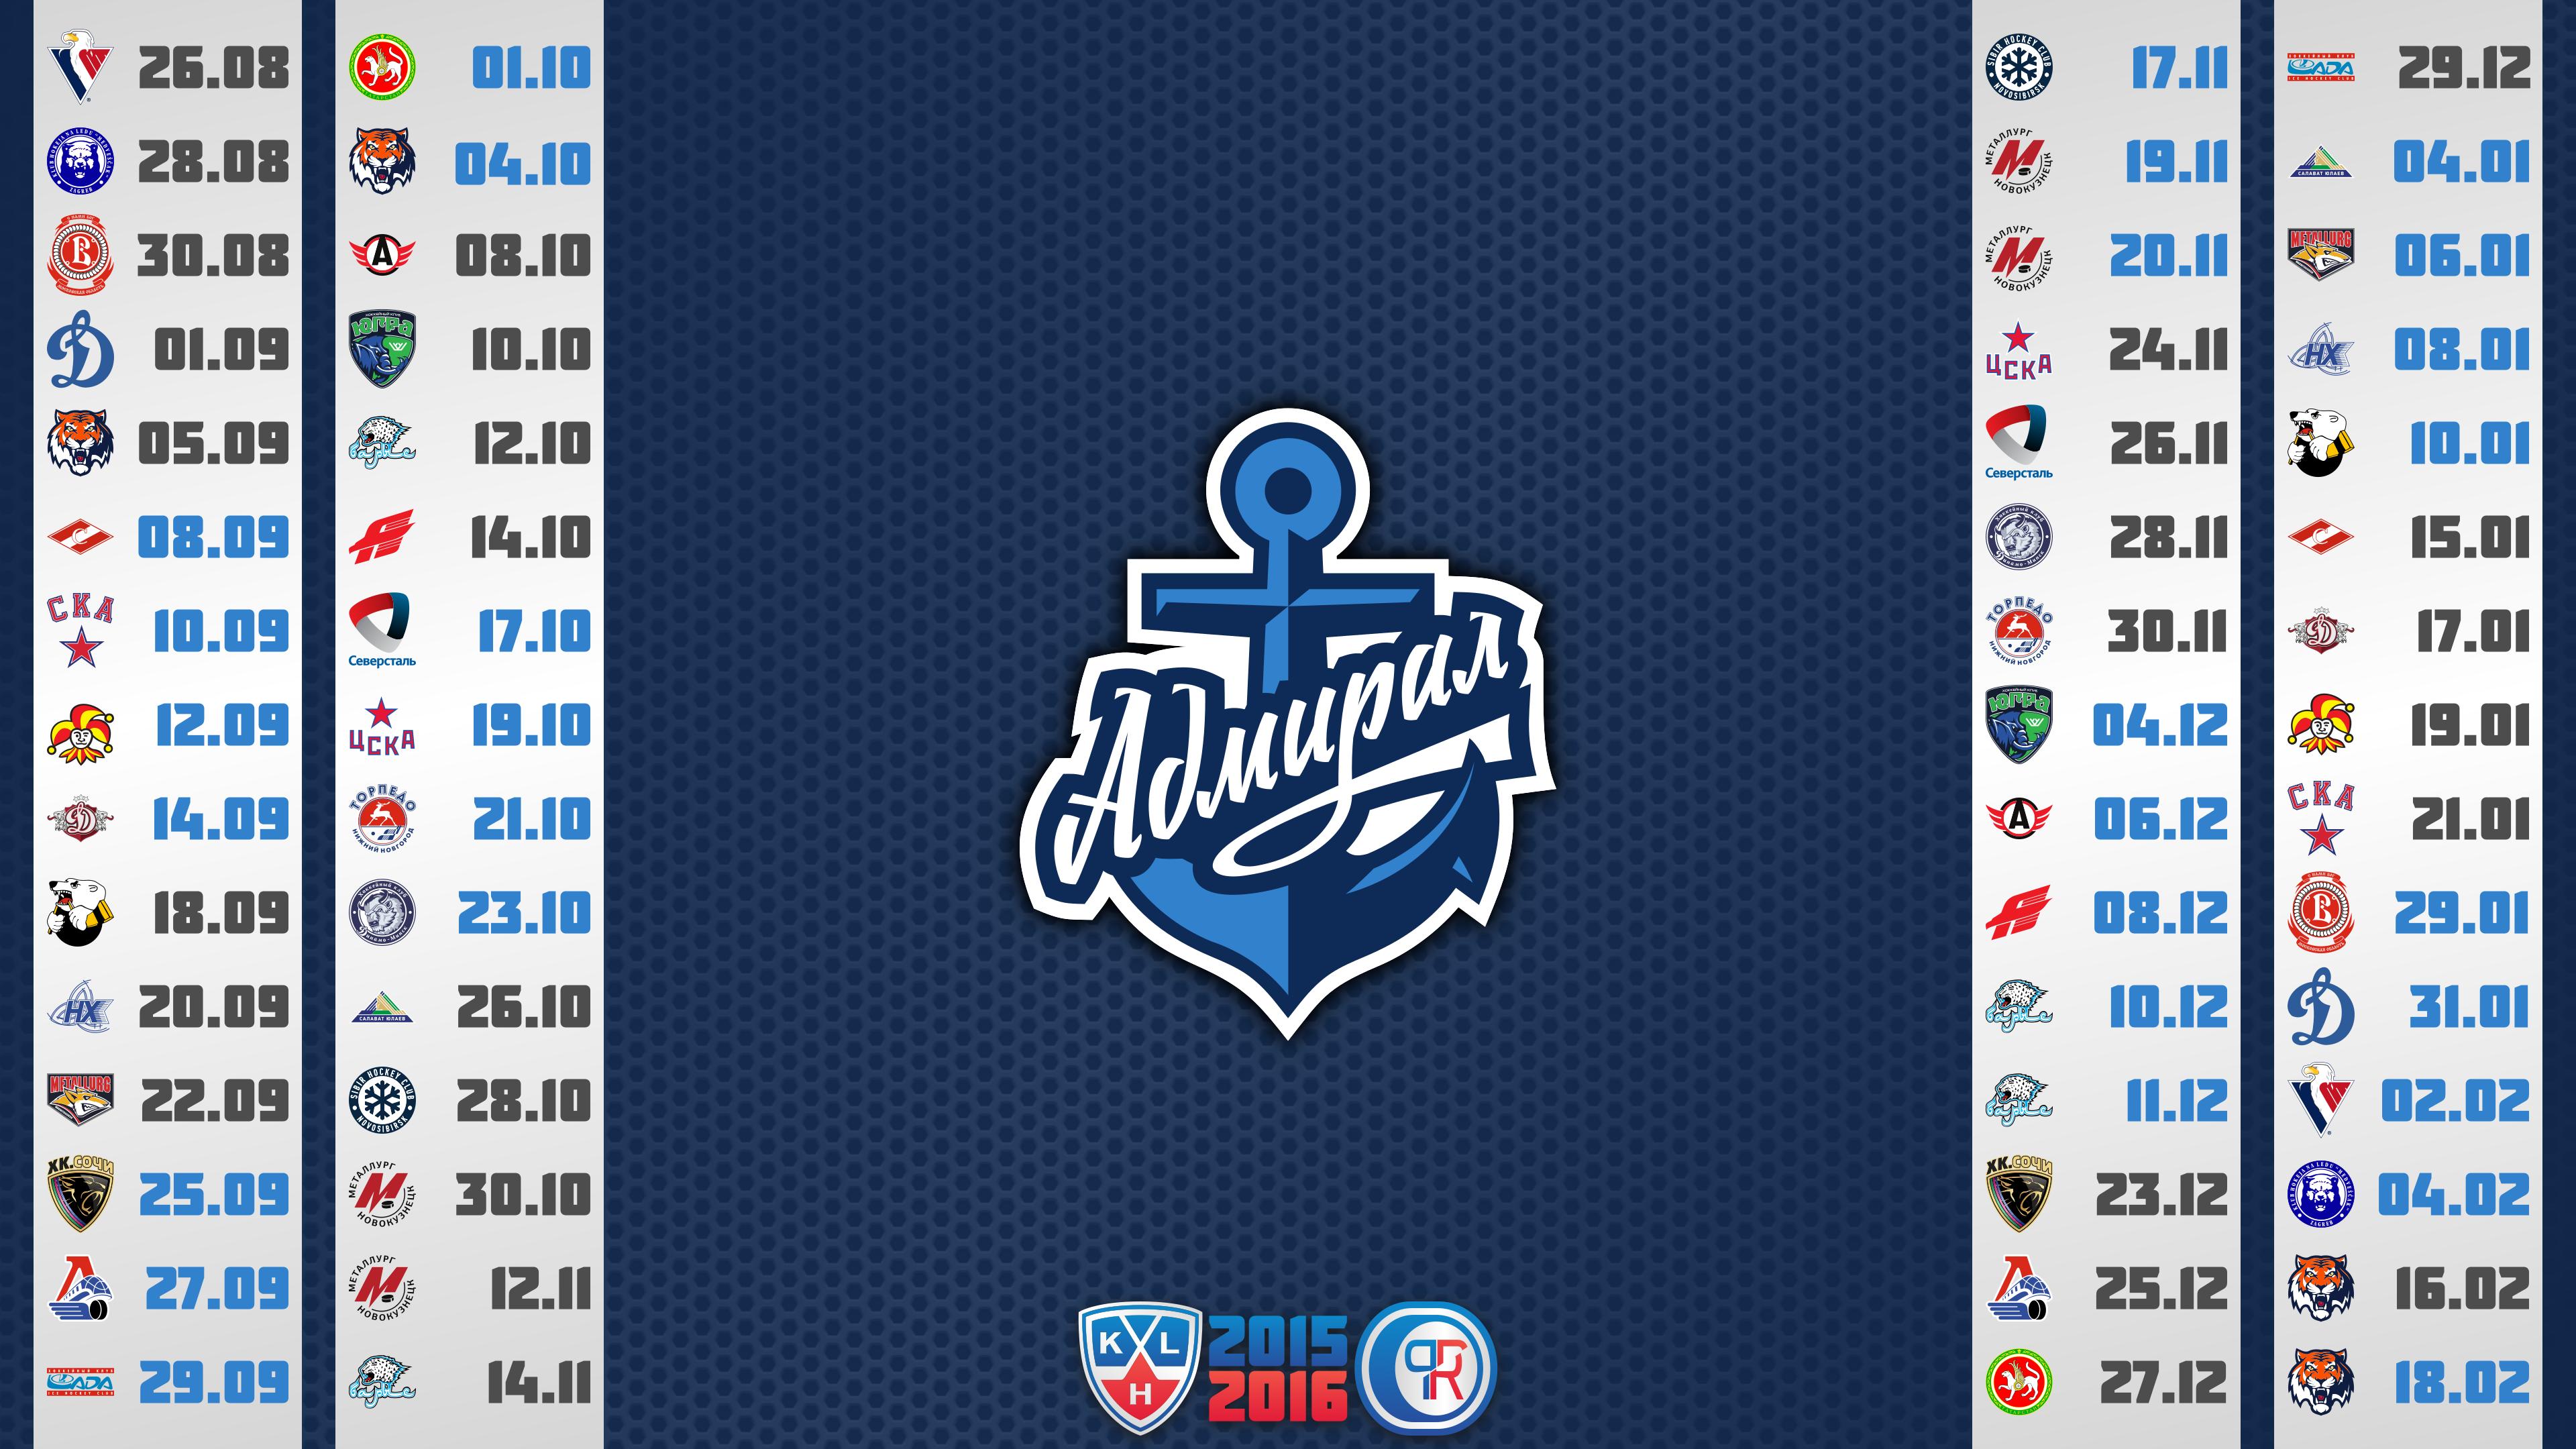 2015 2016 KHL Schedule Wallpapers   Album on Imgur 3840x2160